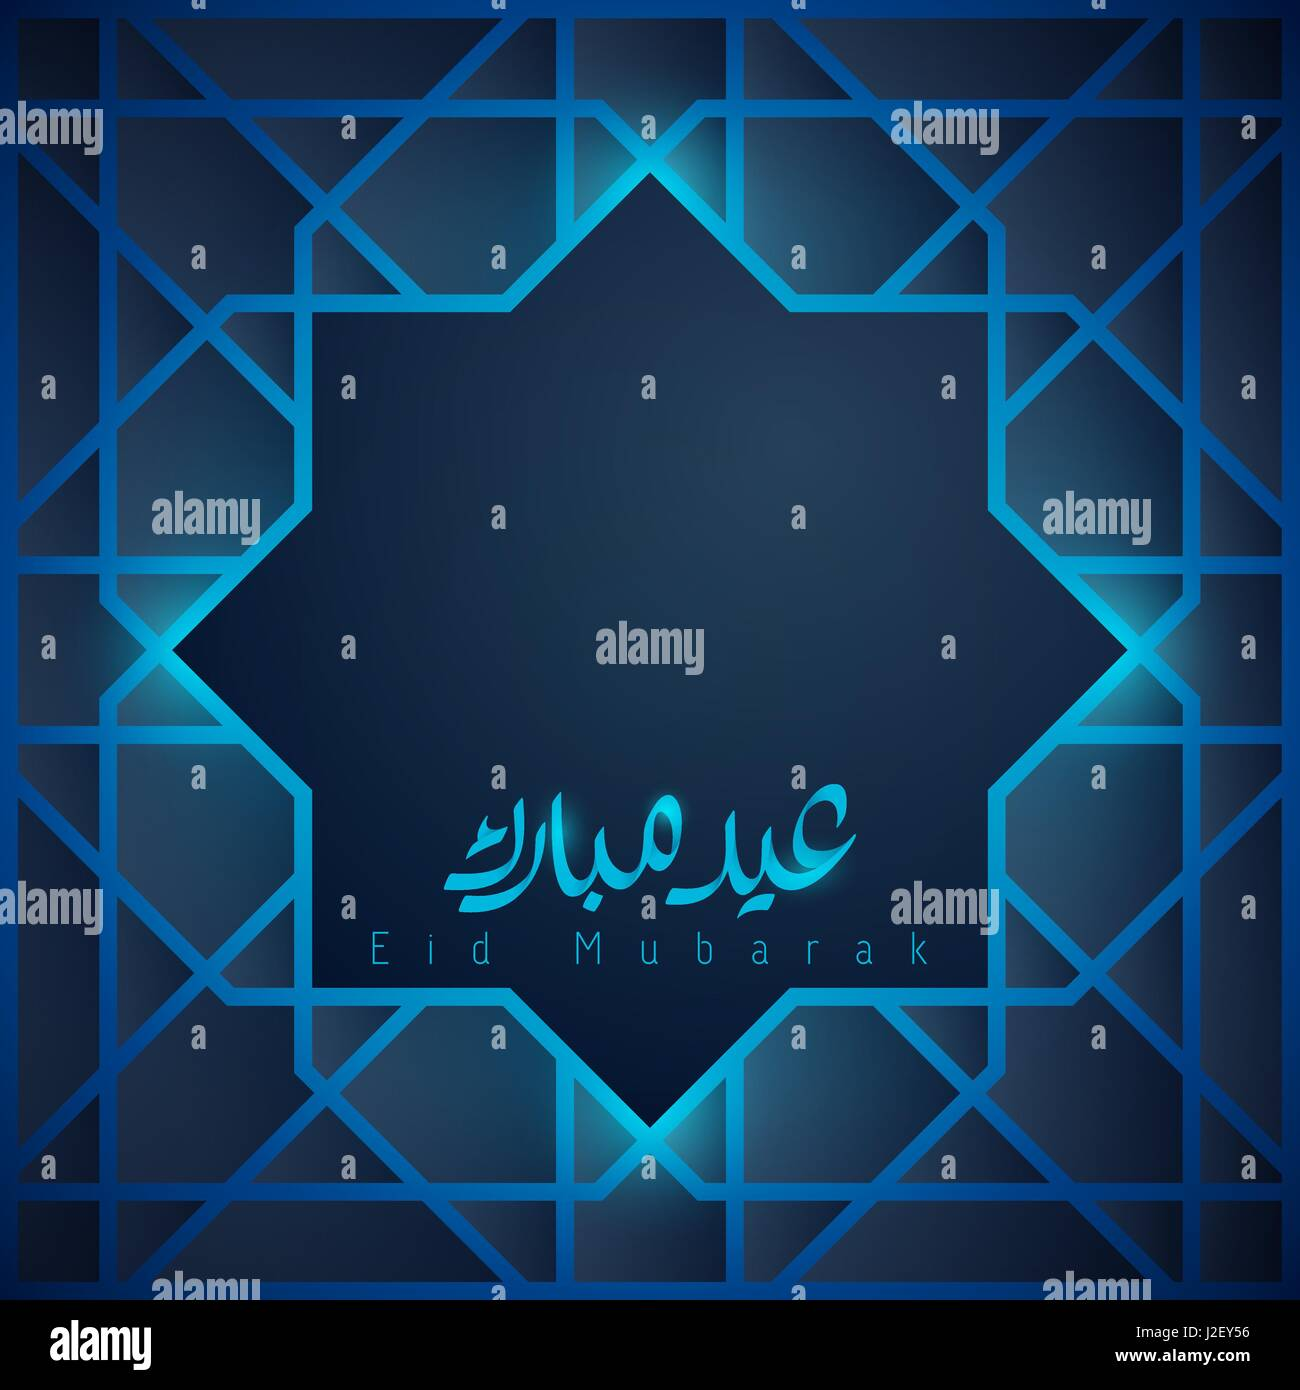 Eid mubarak islamic vector greeting card template morocco geometric eid mubarak islamic vector greeting card template morocco geometric pattern m4hsunfo